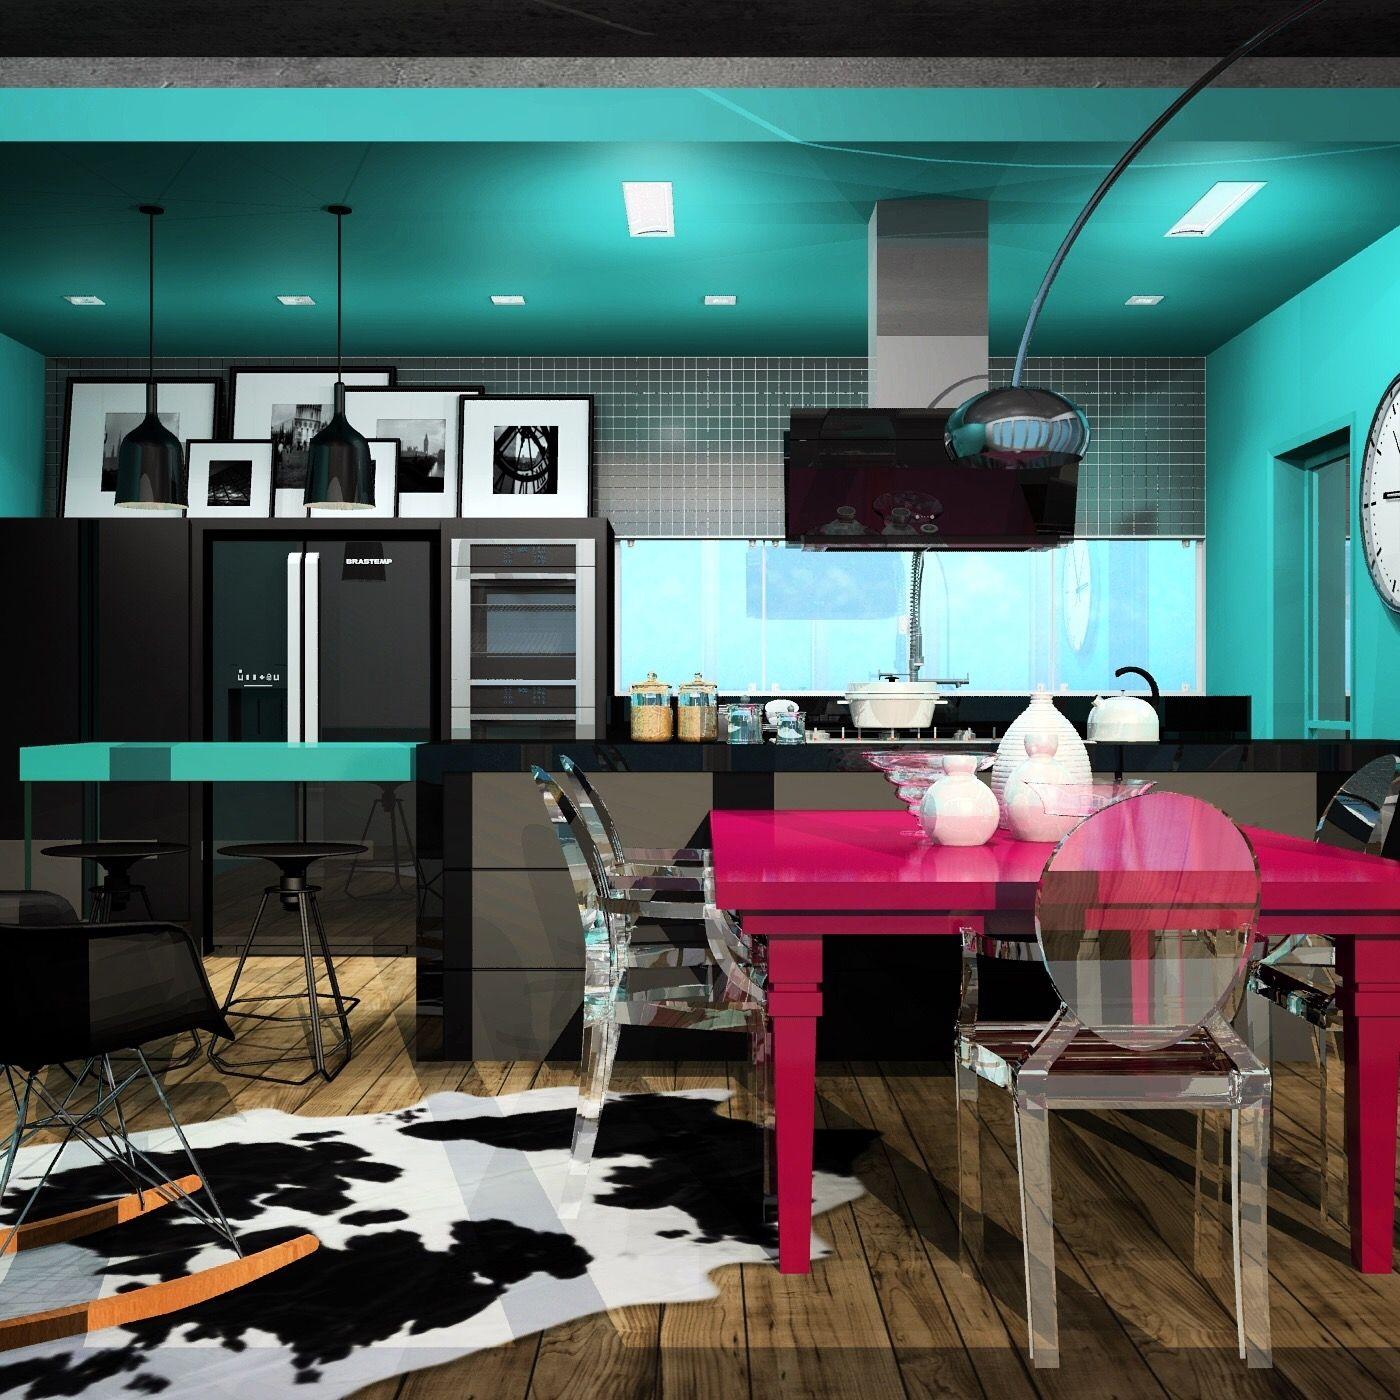 Galeria Promob - Galeria de Projetos - Projetos | D-Interiores ...